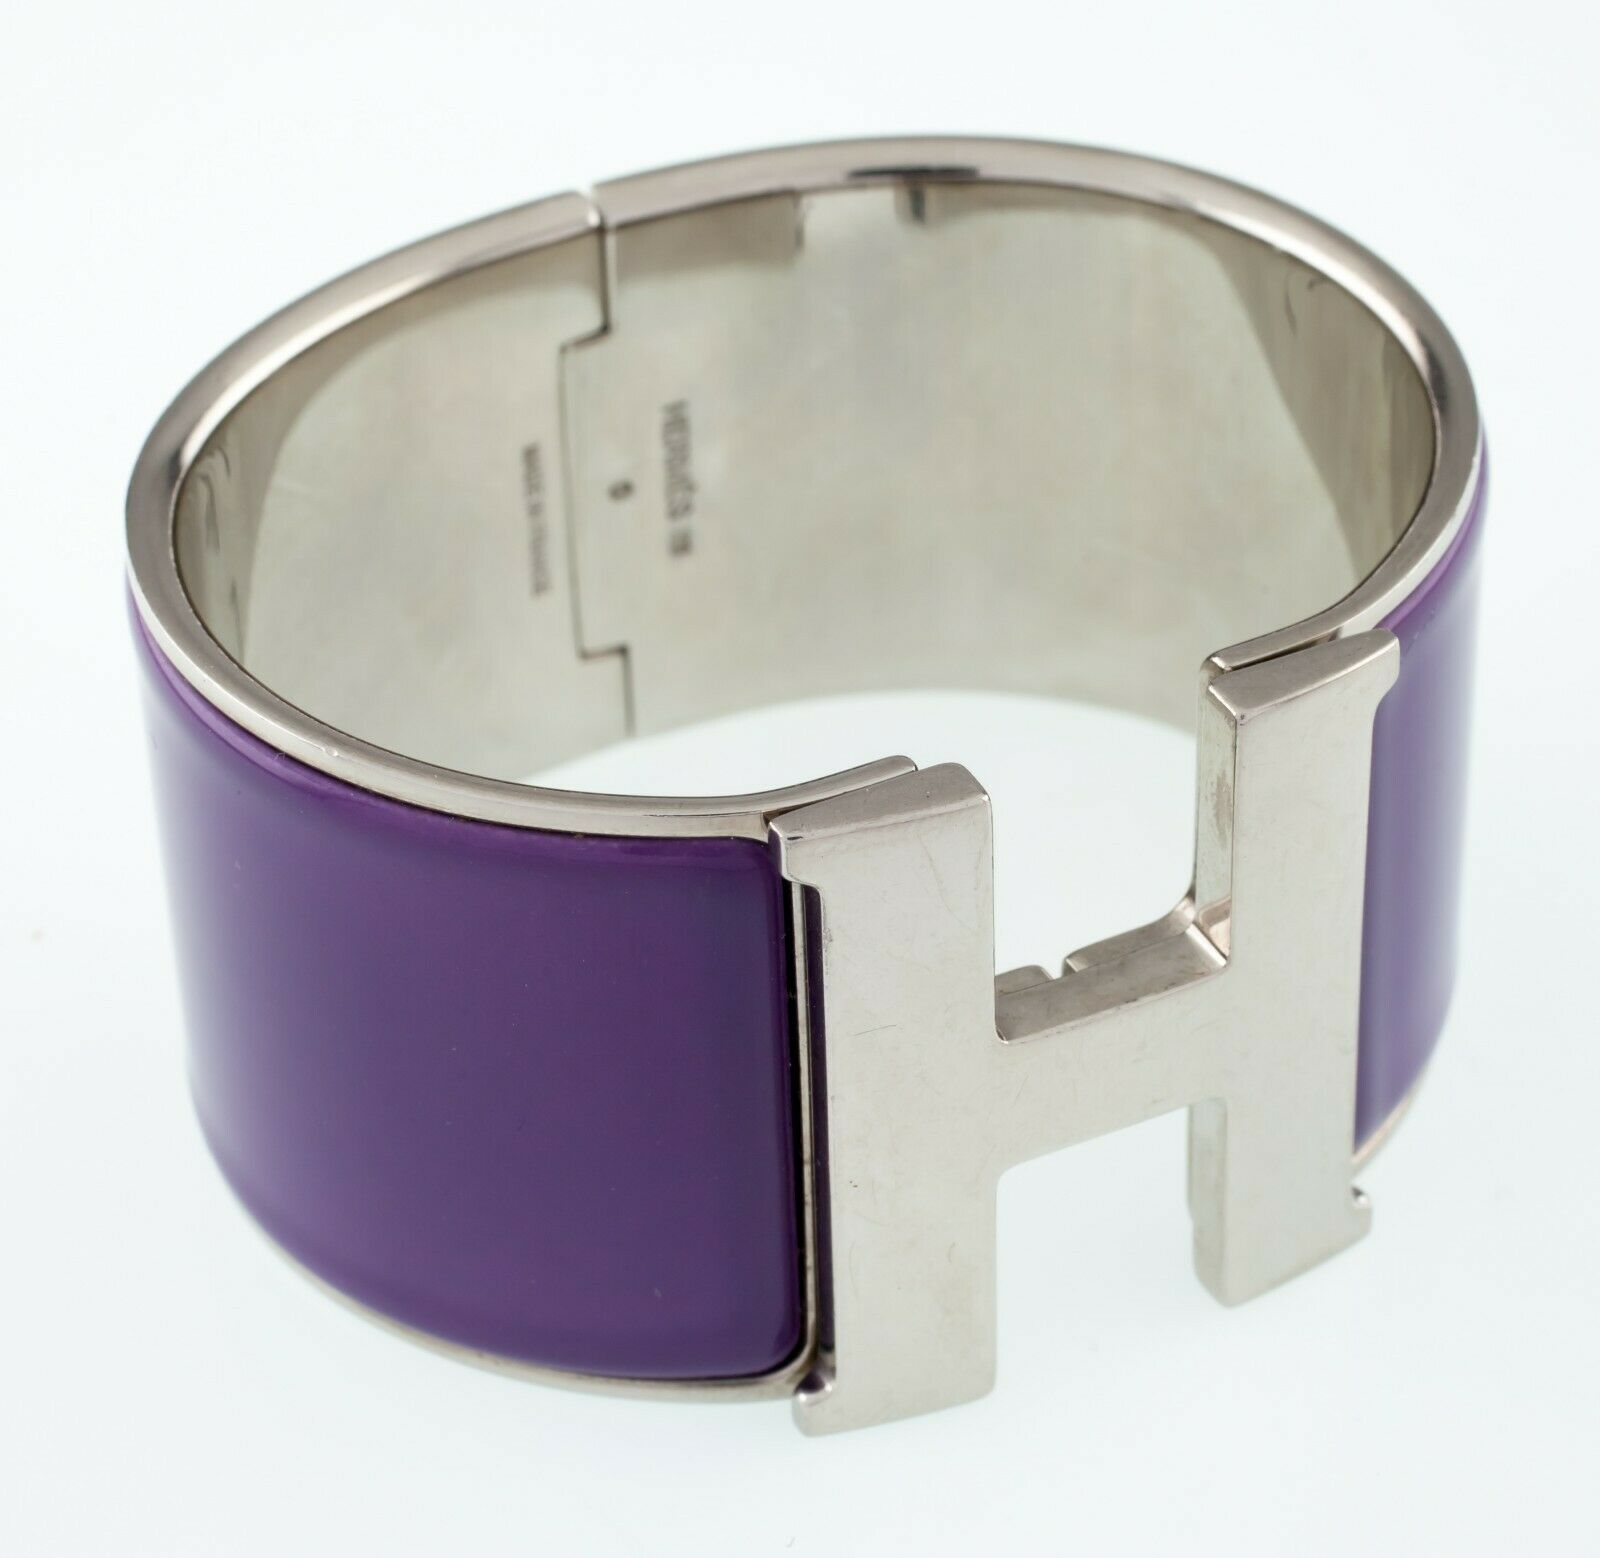 Hermes Clic Clac Violet Extra Large Bracelet Nice!